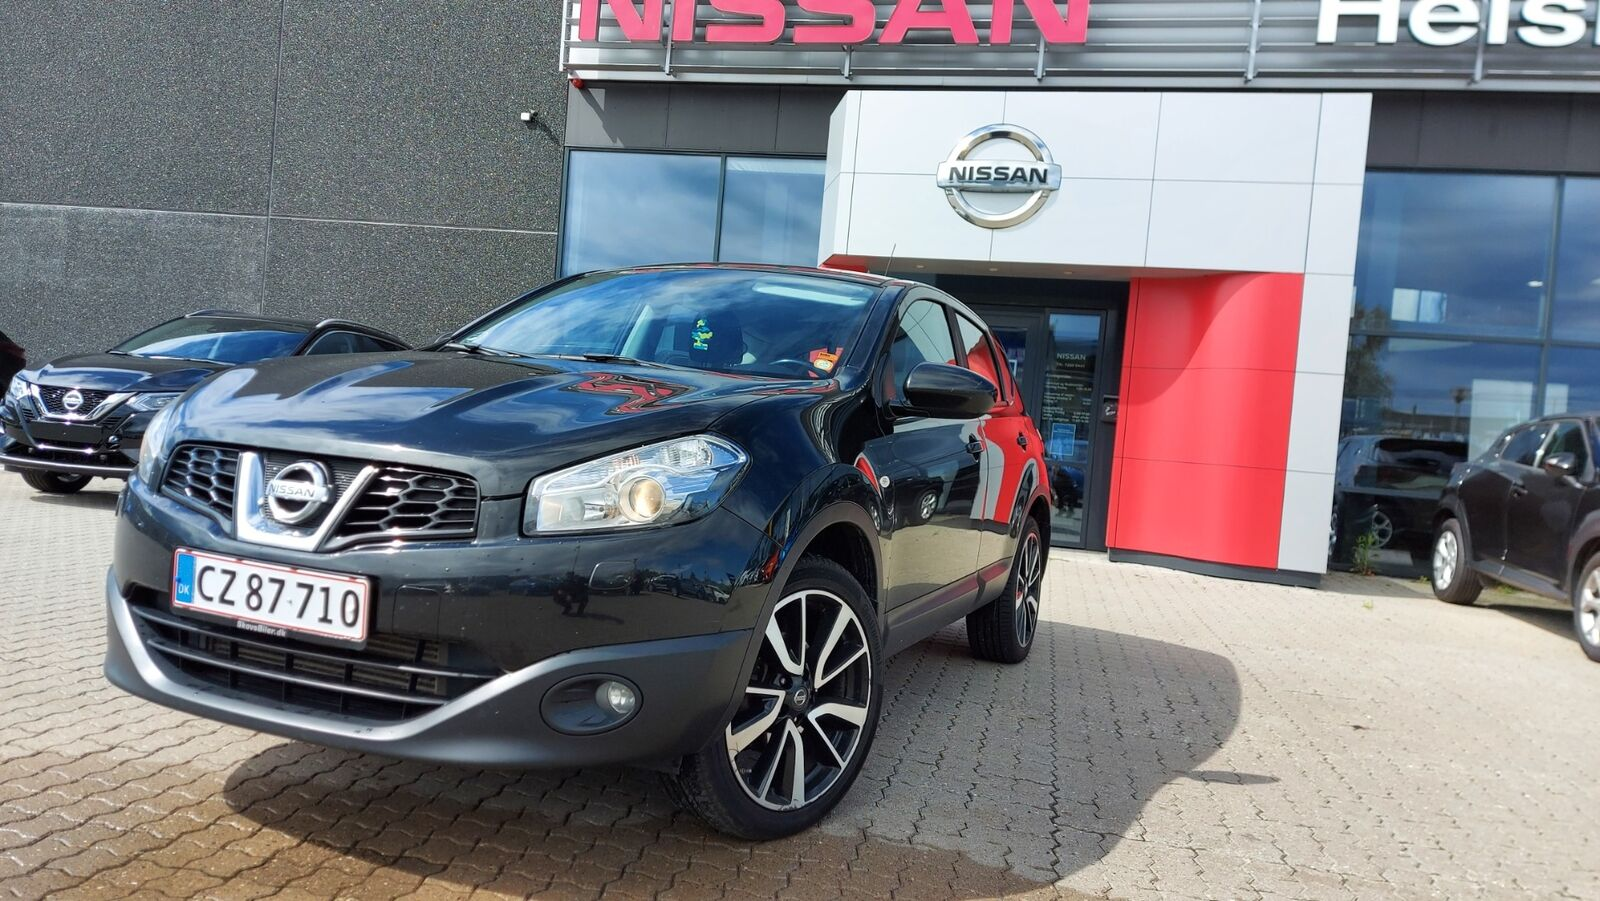 Nissan Qashqai 1,6 dCi Acenta 5d - 79.999 kr.